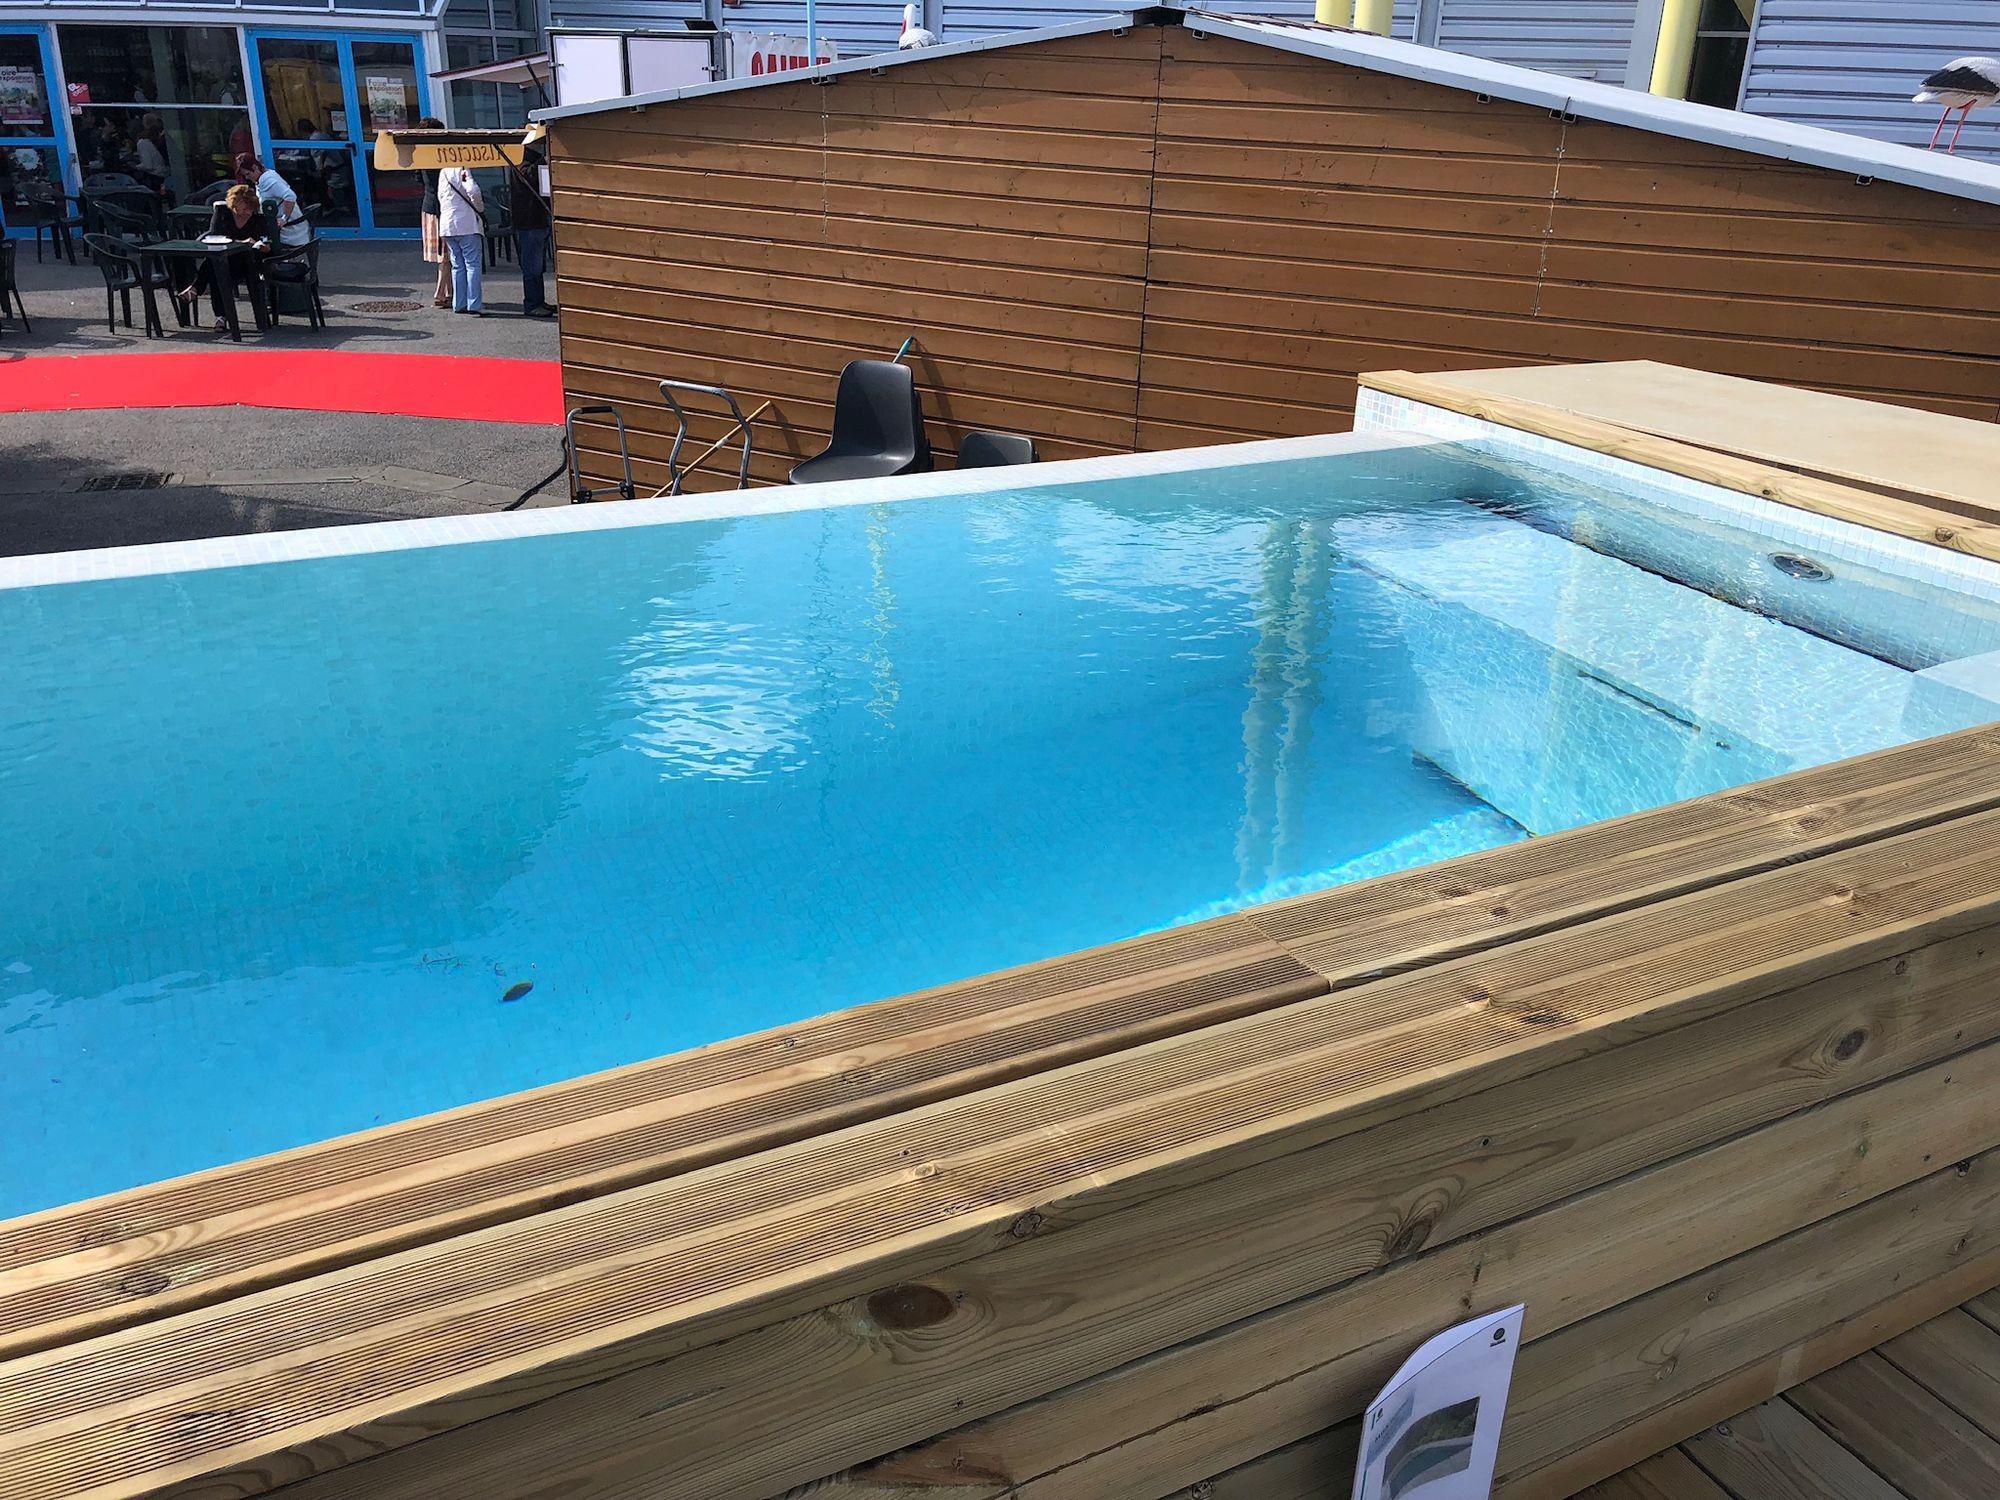 Piscine En Pierre Hors Sol piscine hors-sol / en pierre / d'extérieur city pool infinity 5 x 2 x 1.35  tilestone pools one piece tiled pools